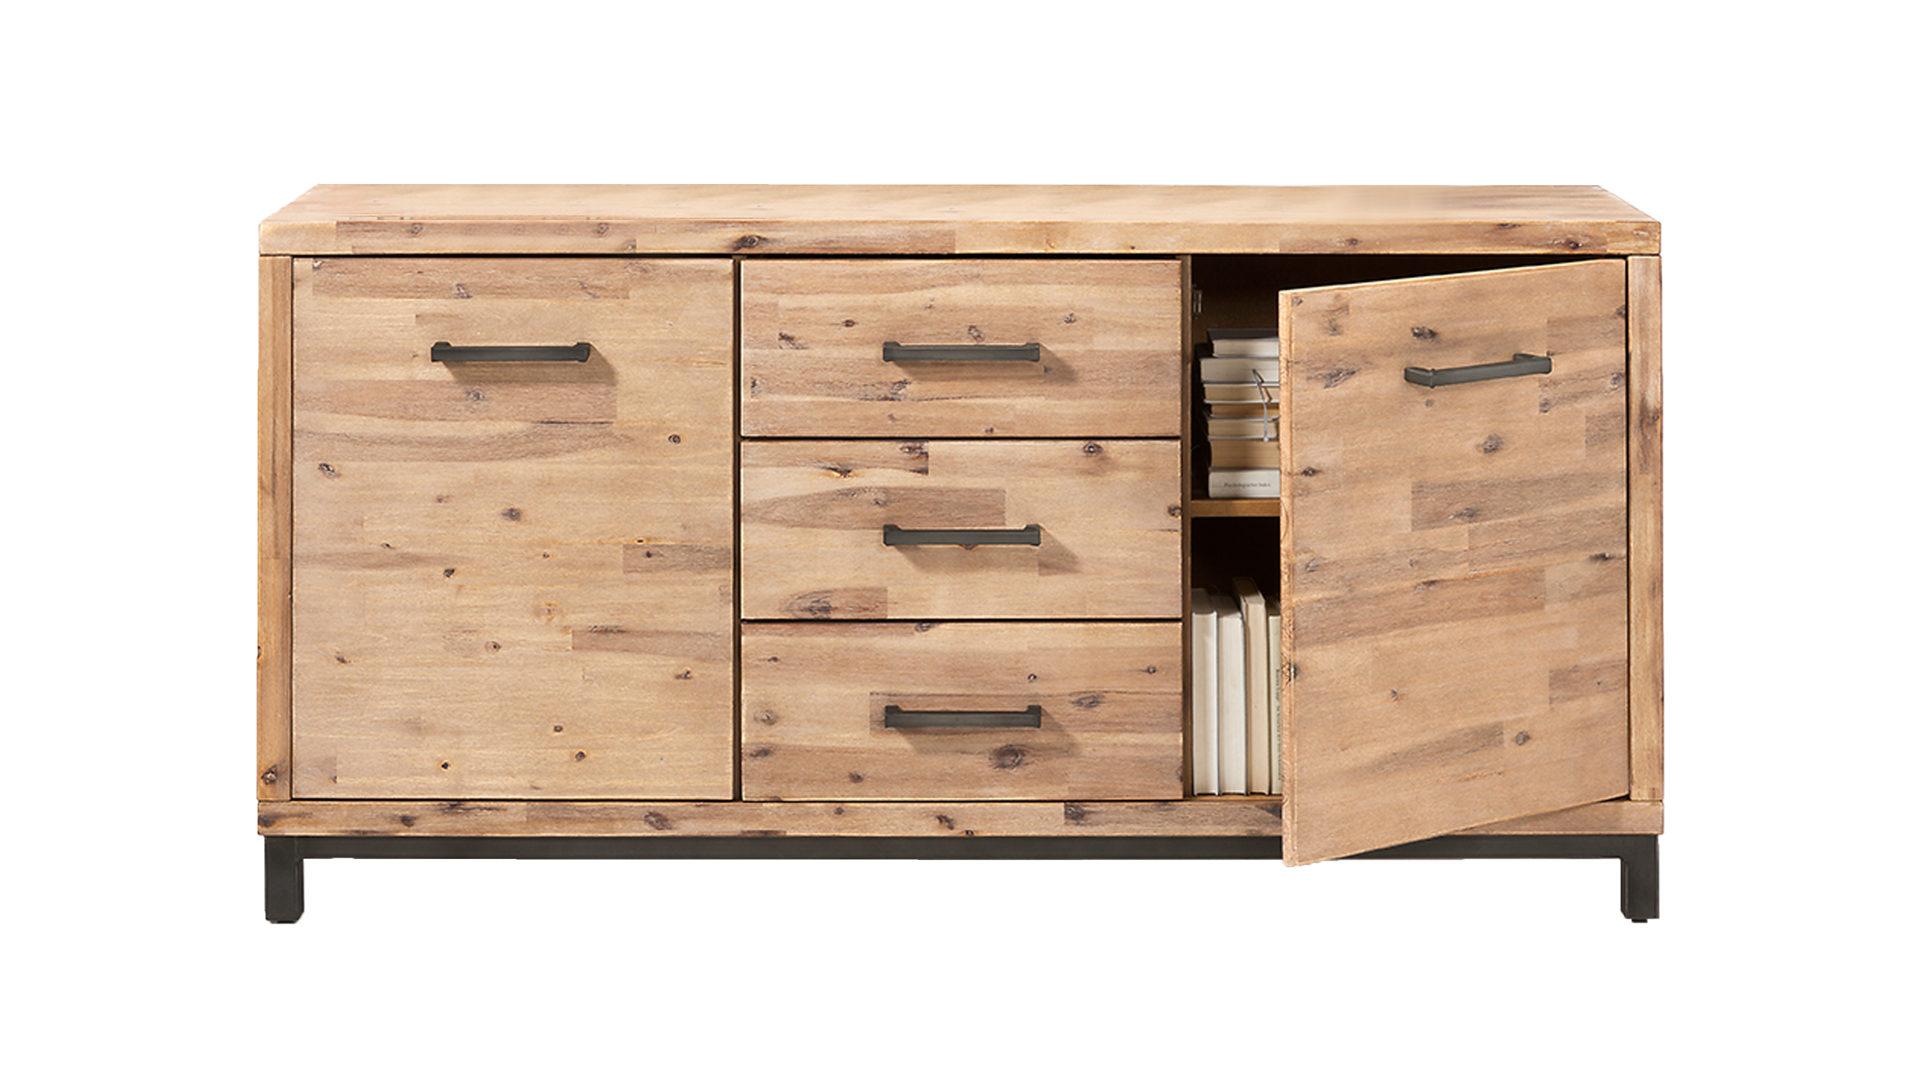 massivholzmöbel - sideboard, new smoke gebeiztes akazienholz